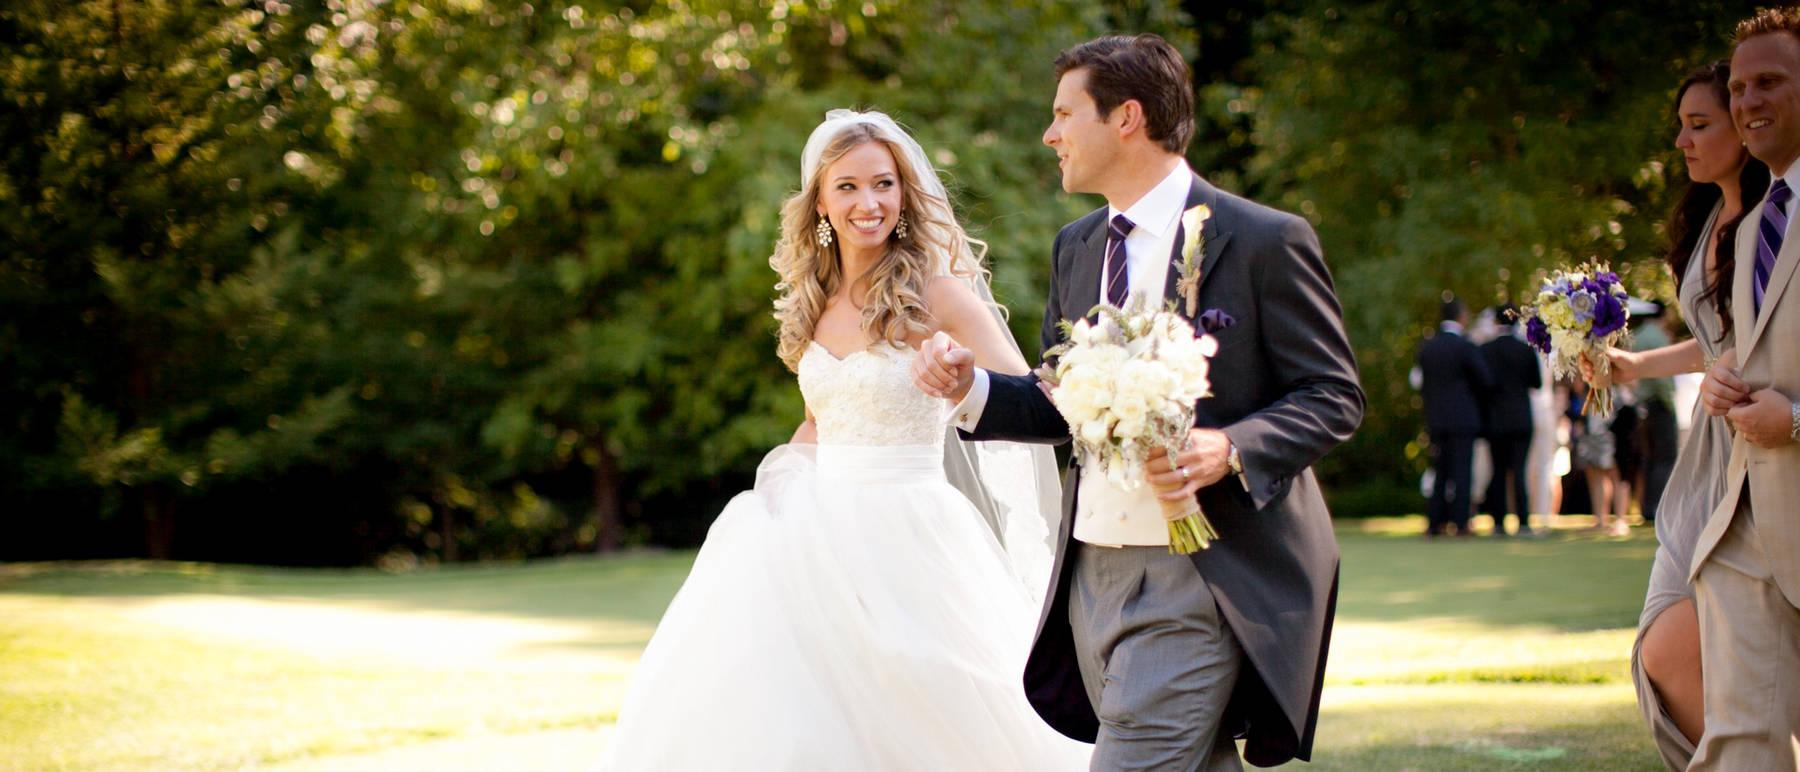 johnandjoseph-wedding-photographer-hz-slider-326